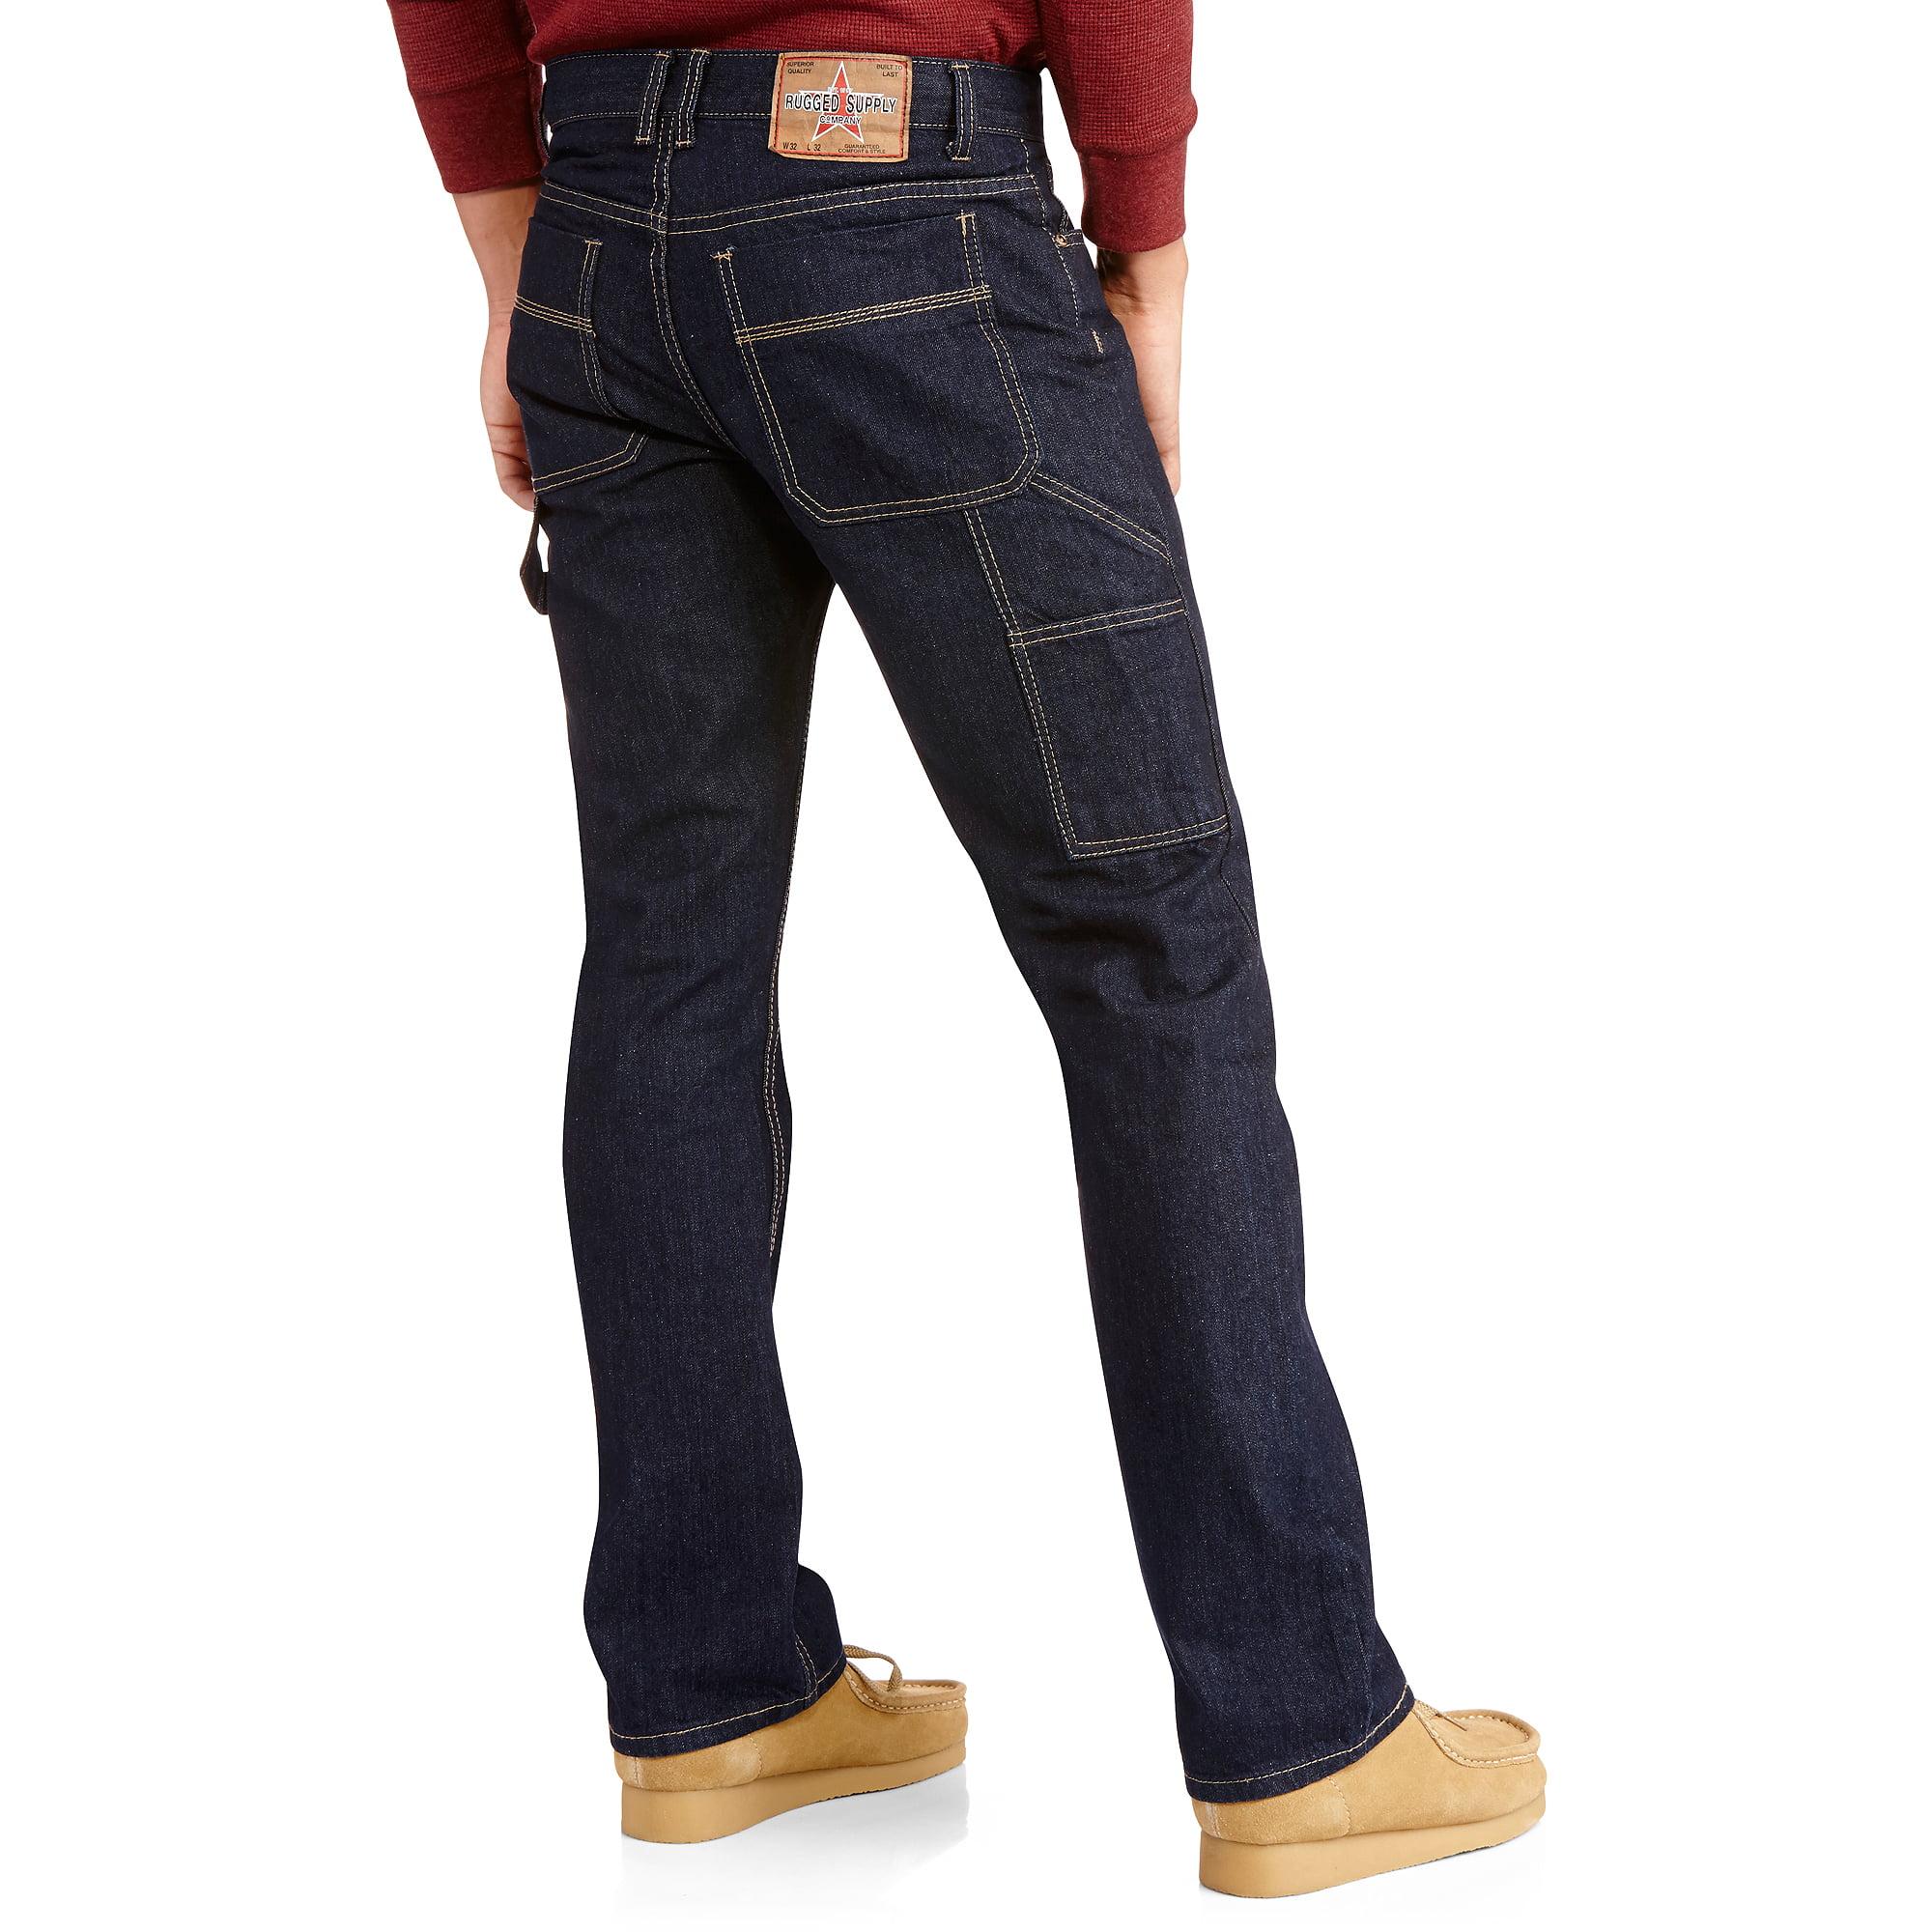 Rugged Supply Men's Carpenter jean